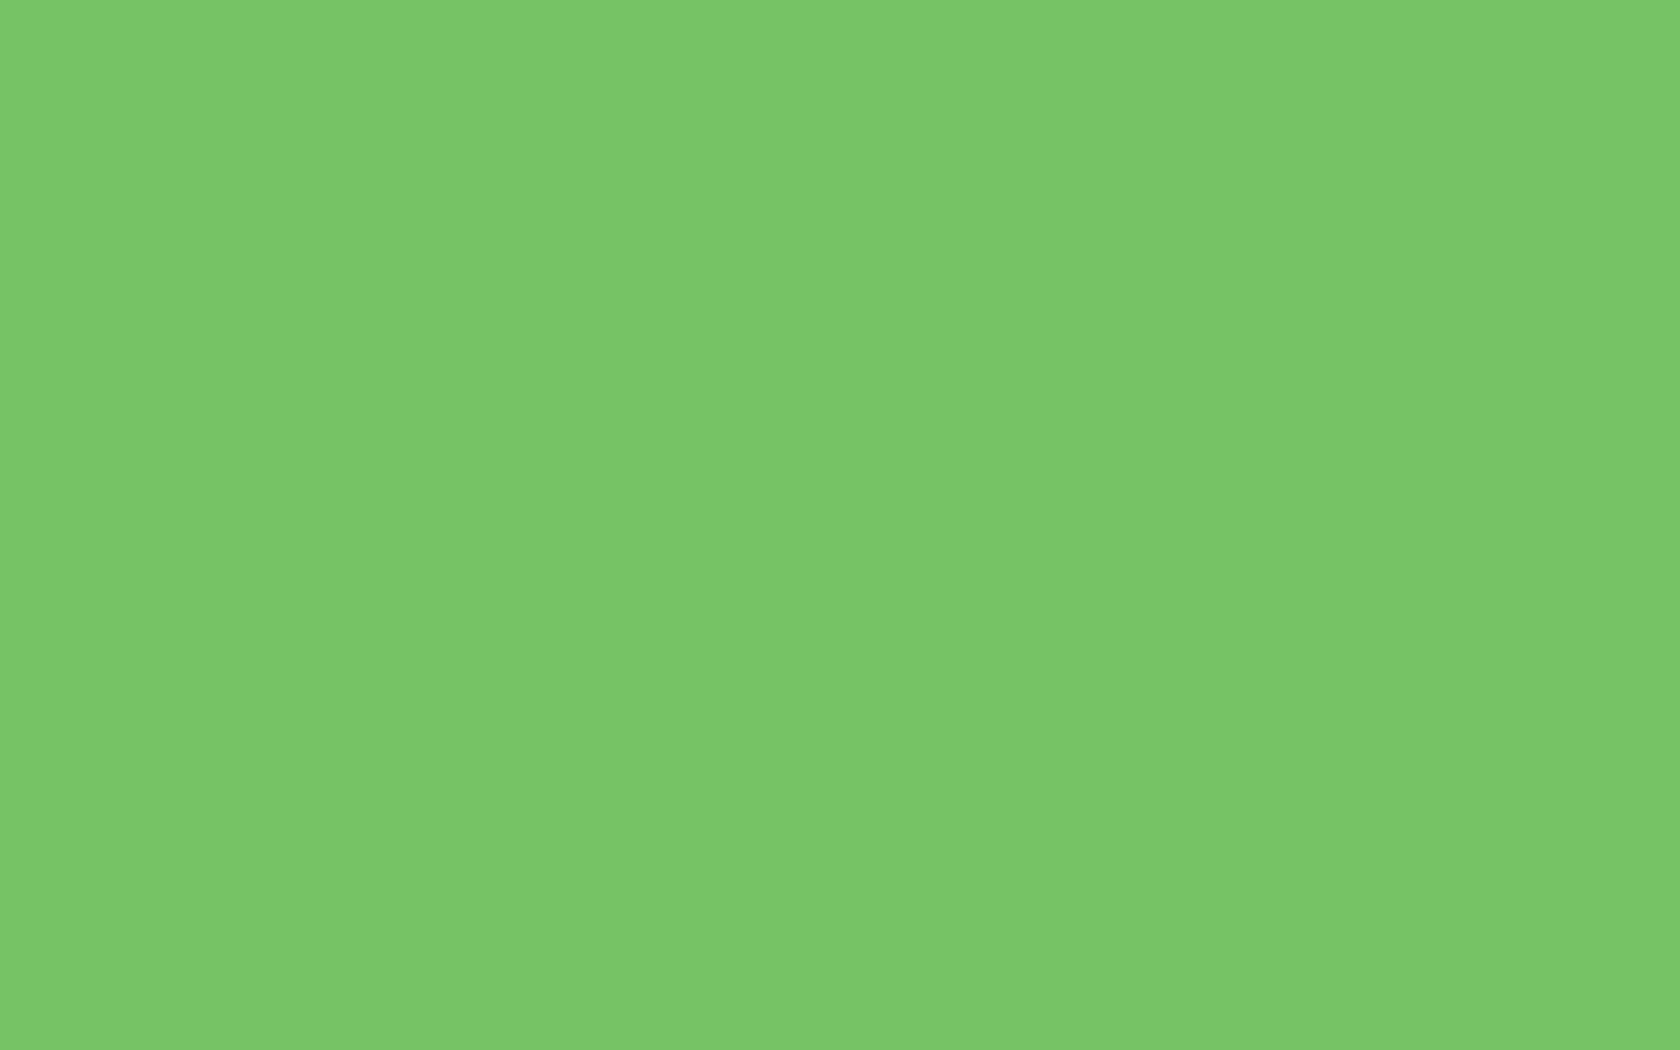 1680x1050 Mantis Solid Color Background